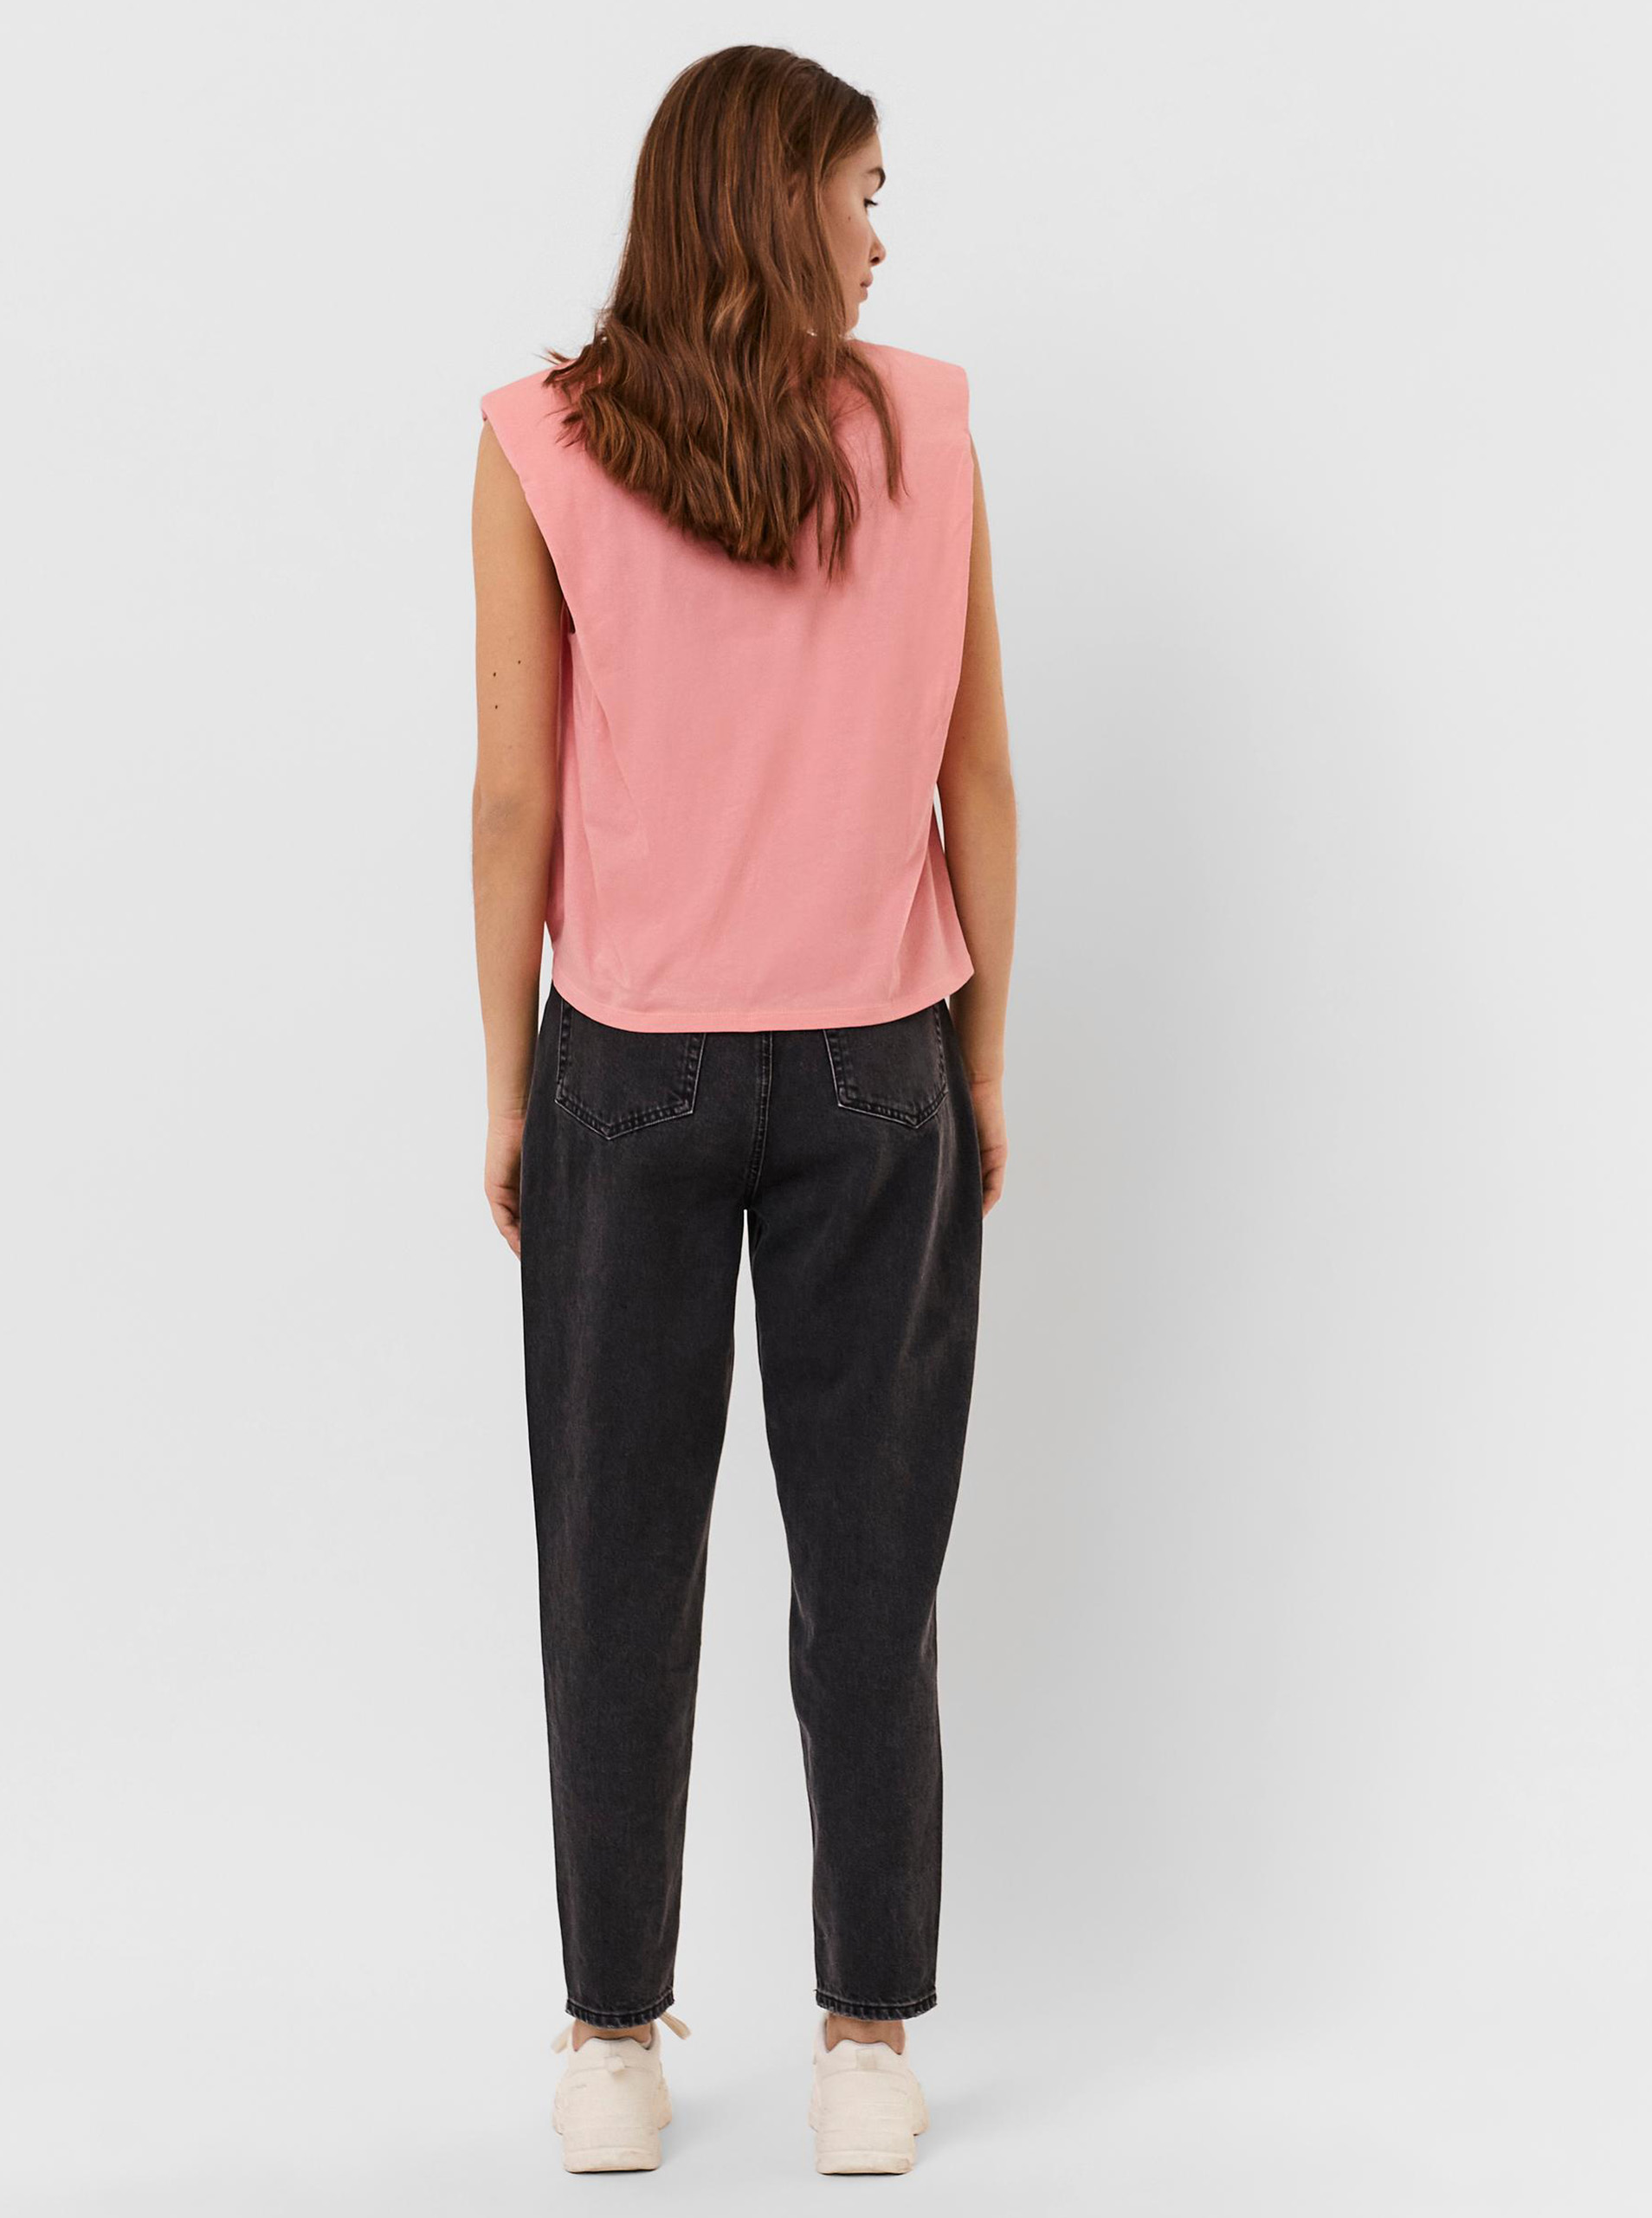 Vero Moda pink T-shirt Hollie